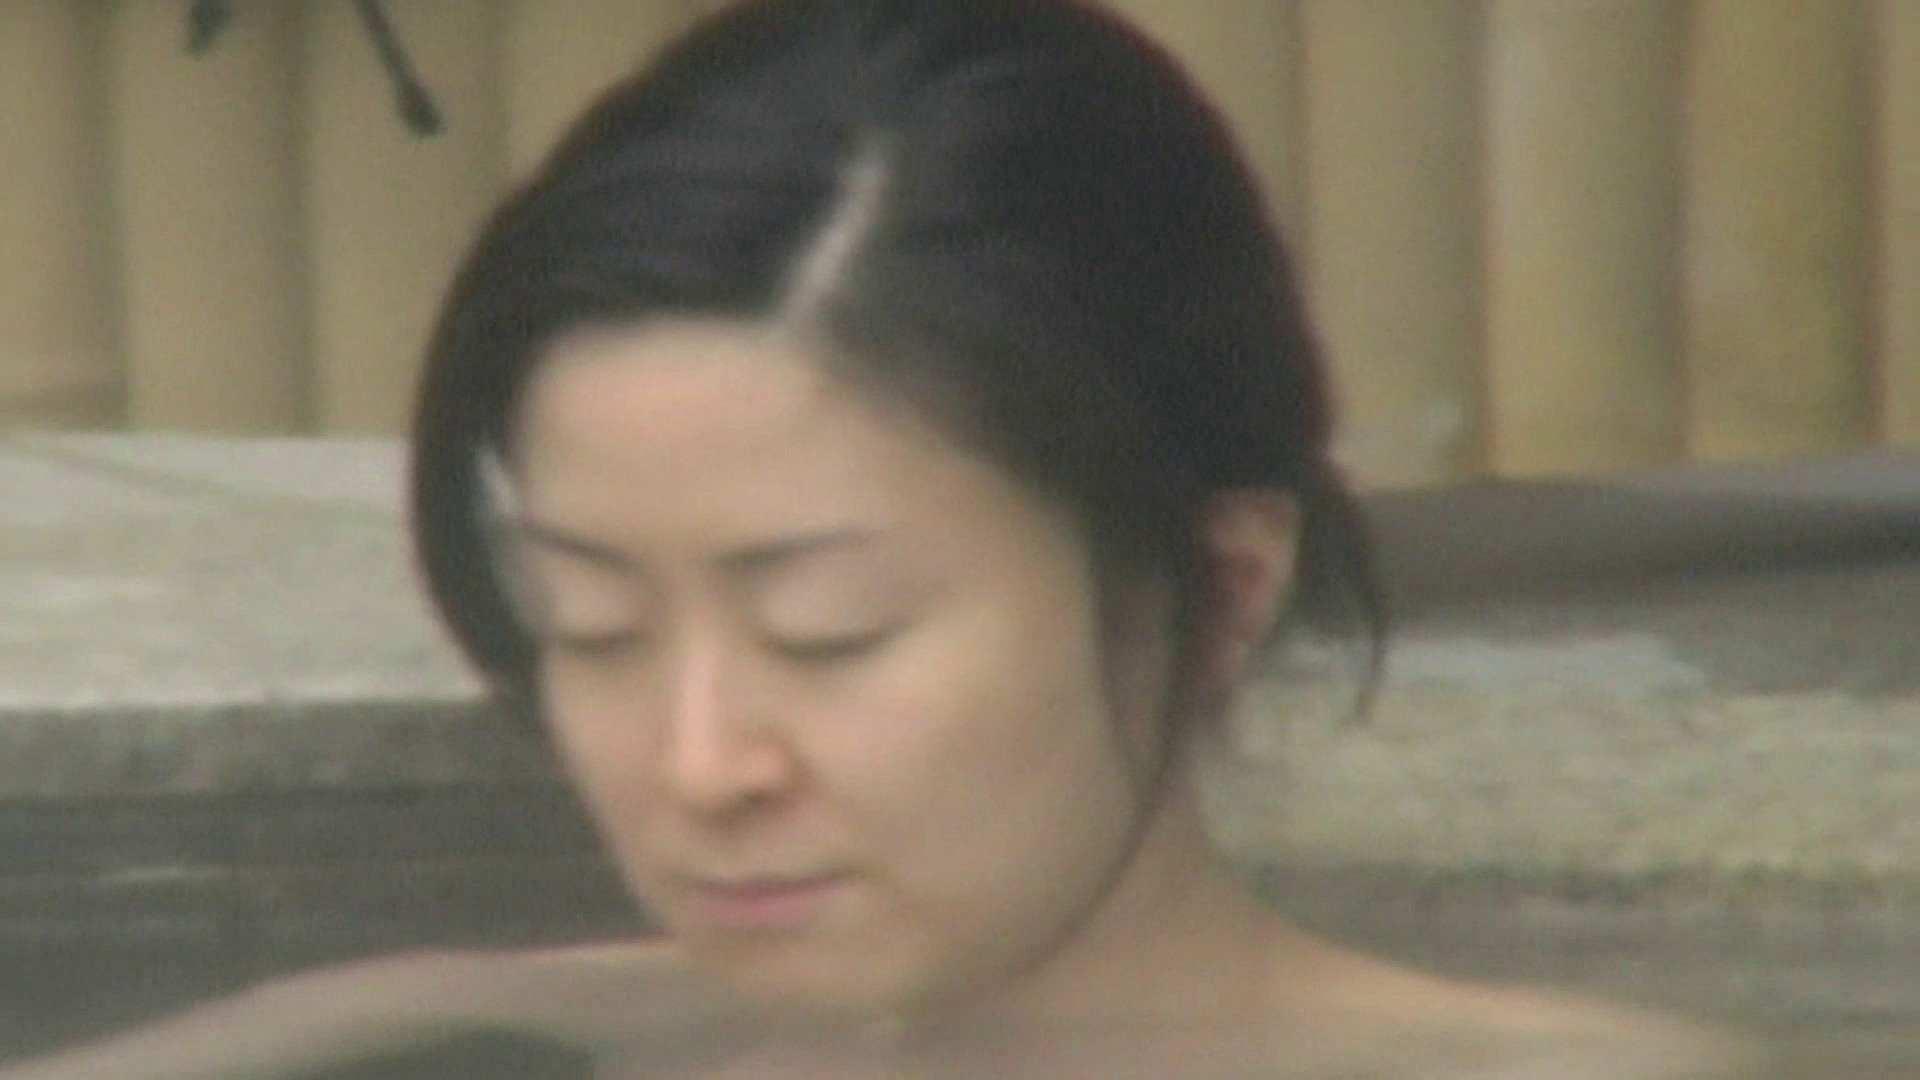 Aquaな露天風呂Vol.548 OLセックス のぞきエロ無料画像 103画像 44